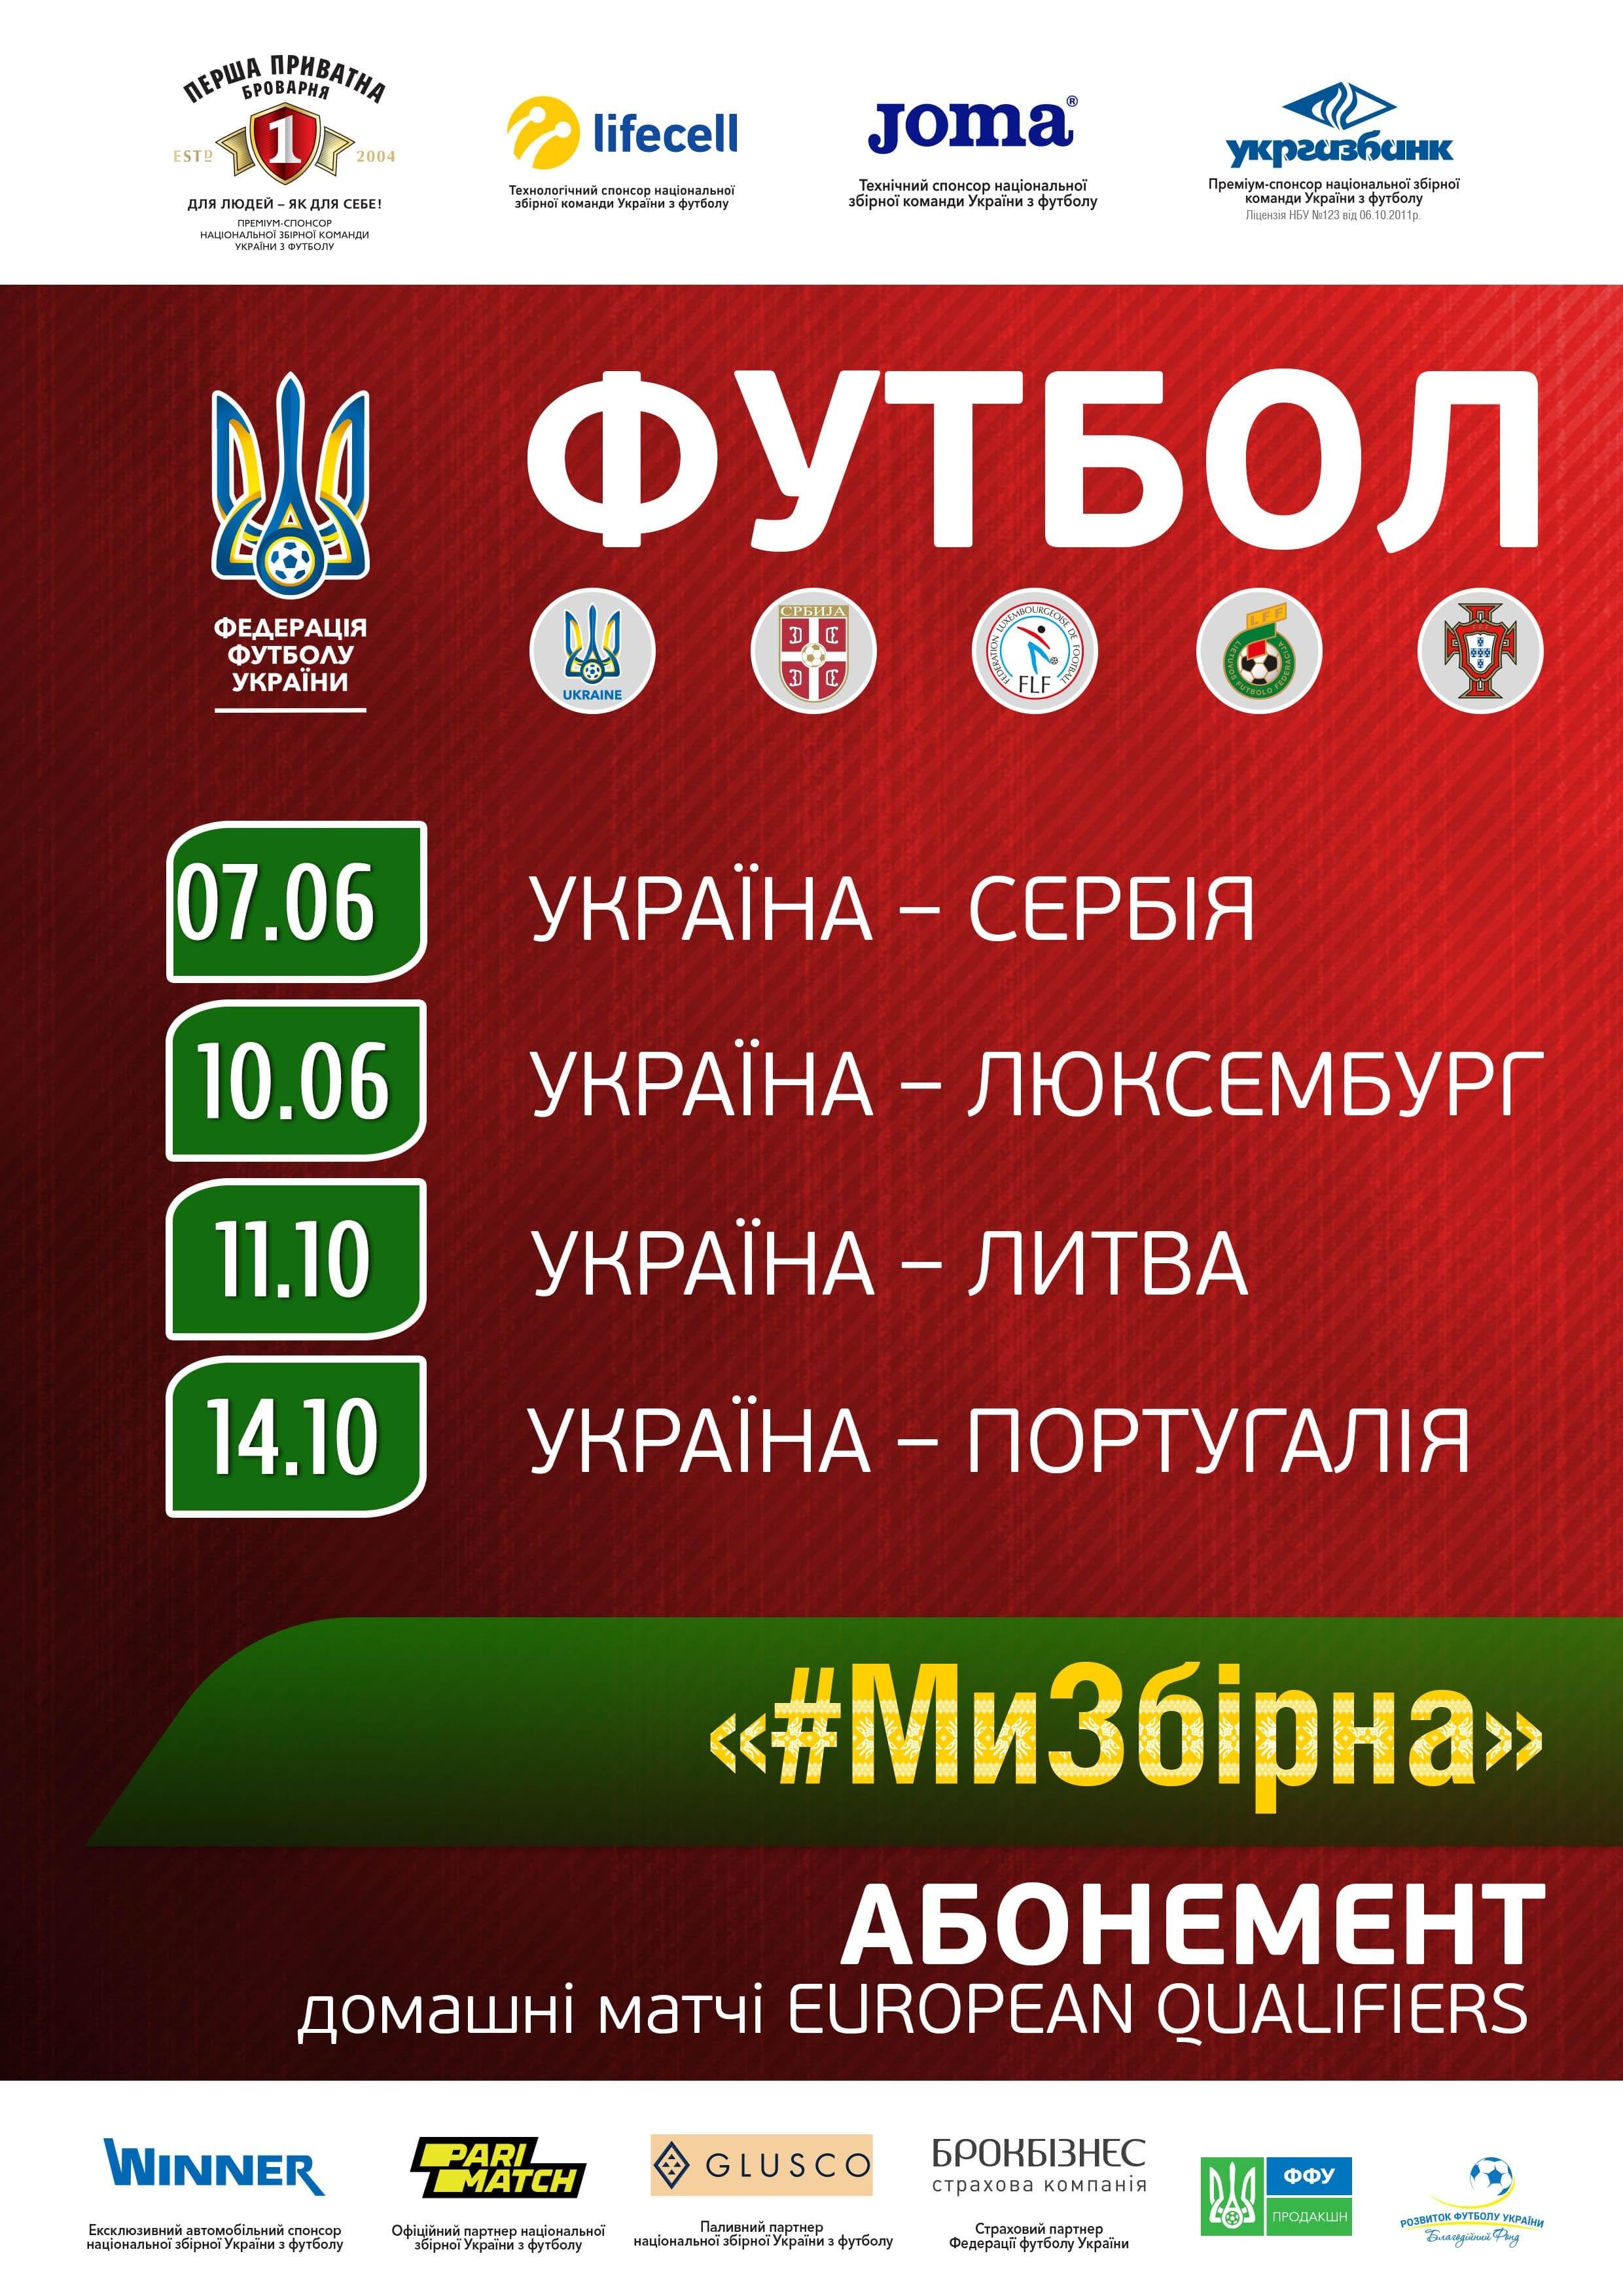 Билеты Абонемент - домашние матчи European Qualifiers